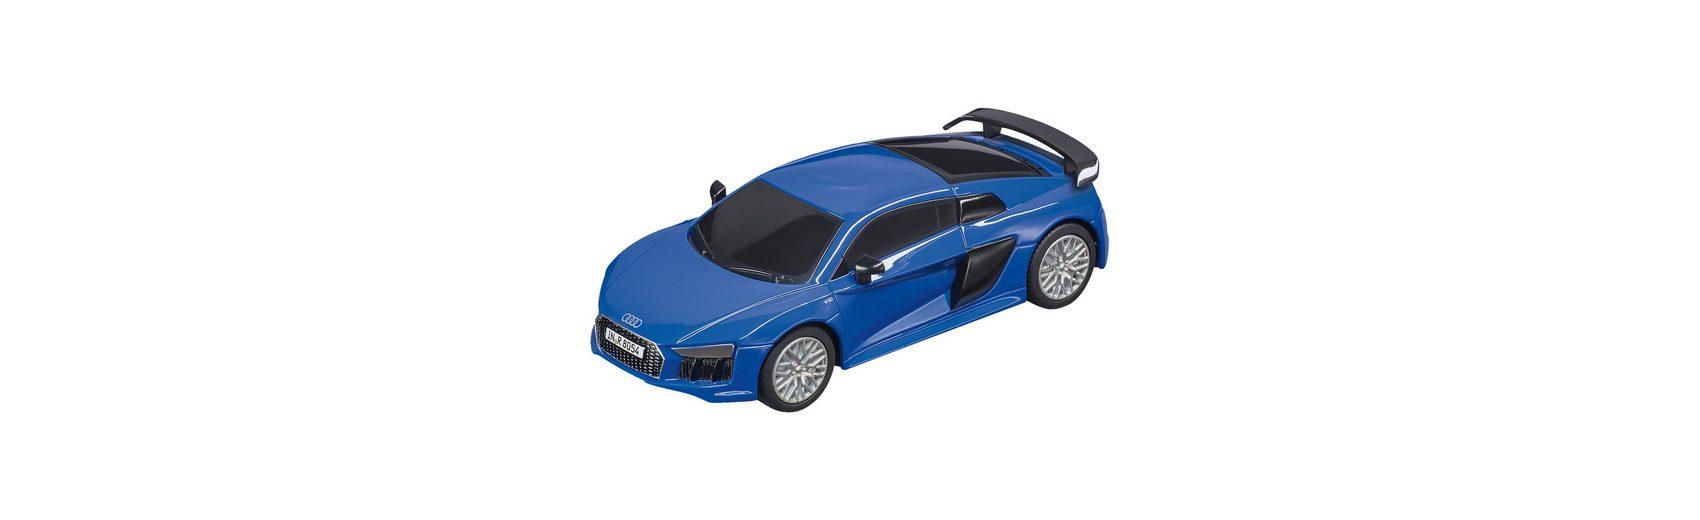 Carrera Digital 143 41395 Audi R8 V10 Plus